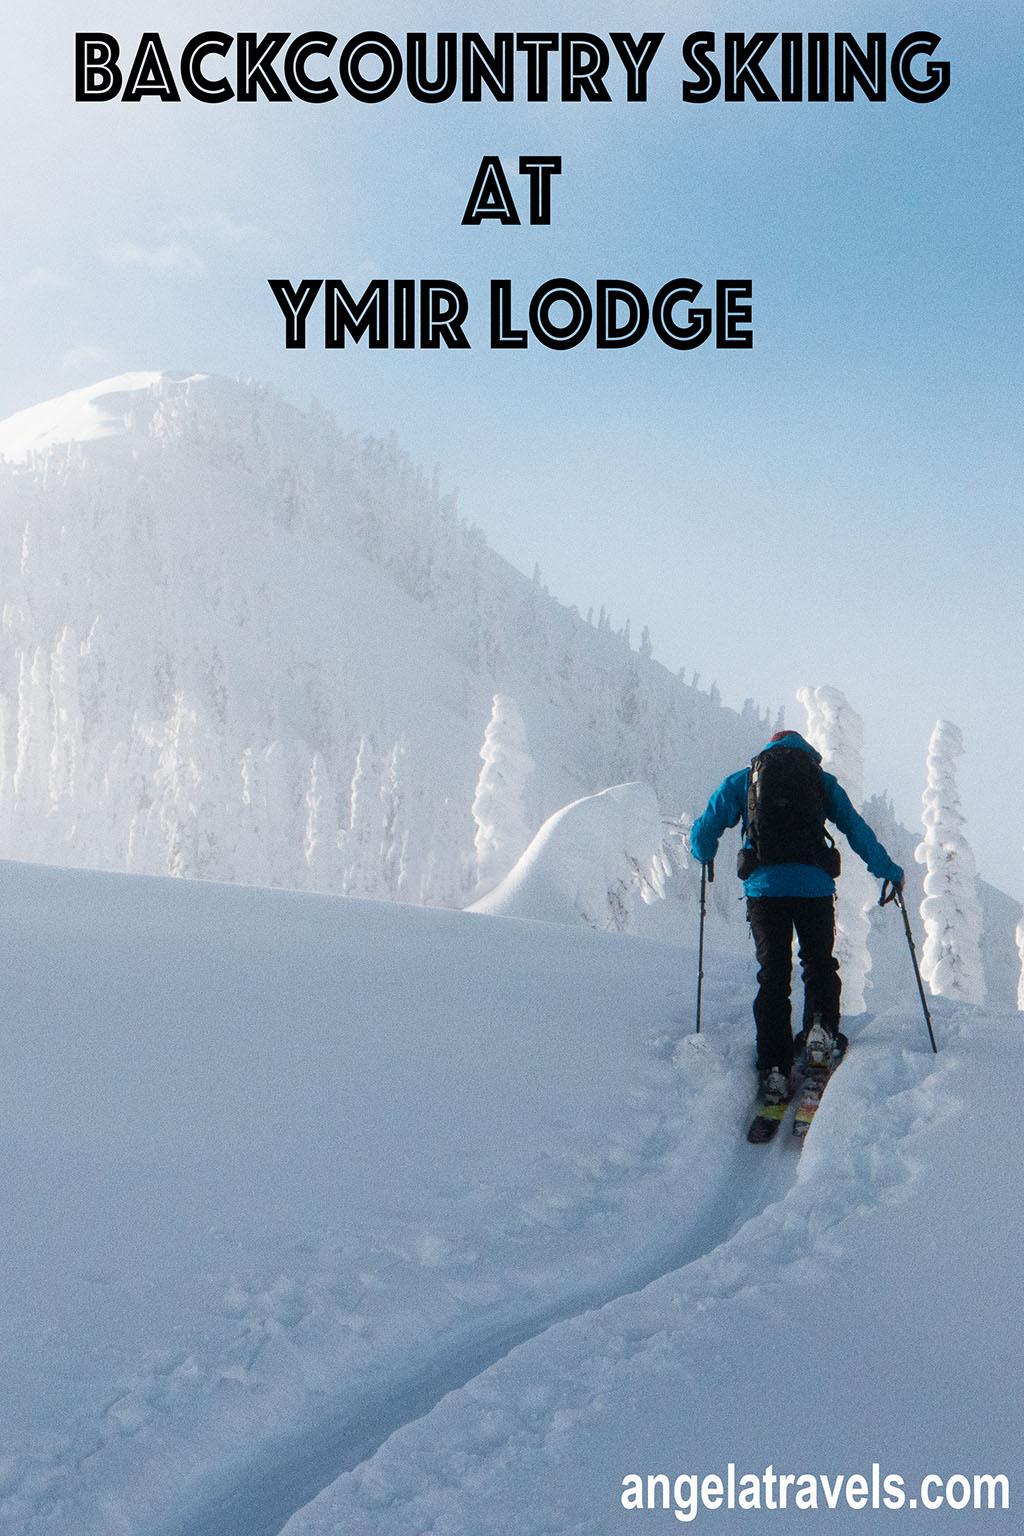 Trip Report: Backcountry Skiing at Ymir, British Columbia